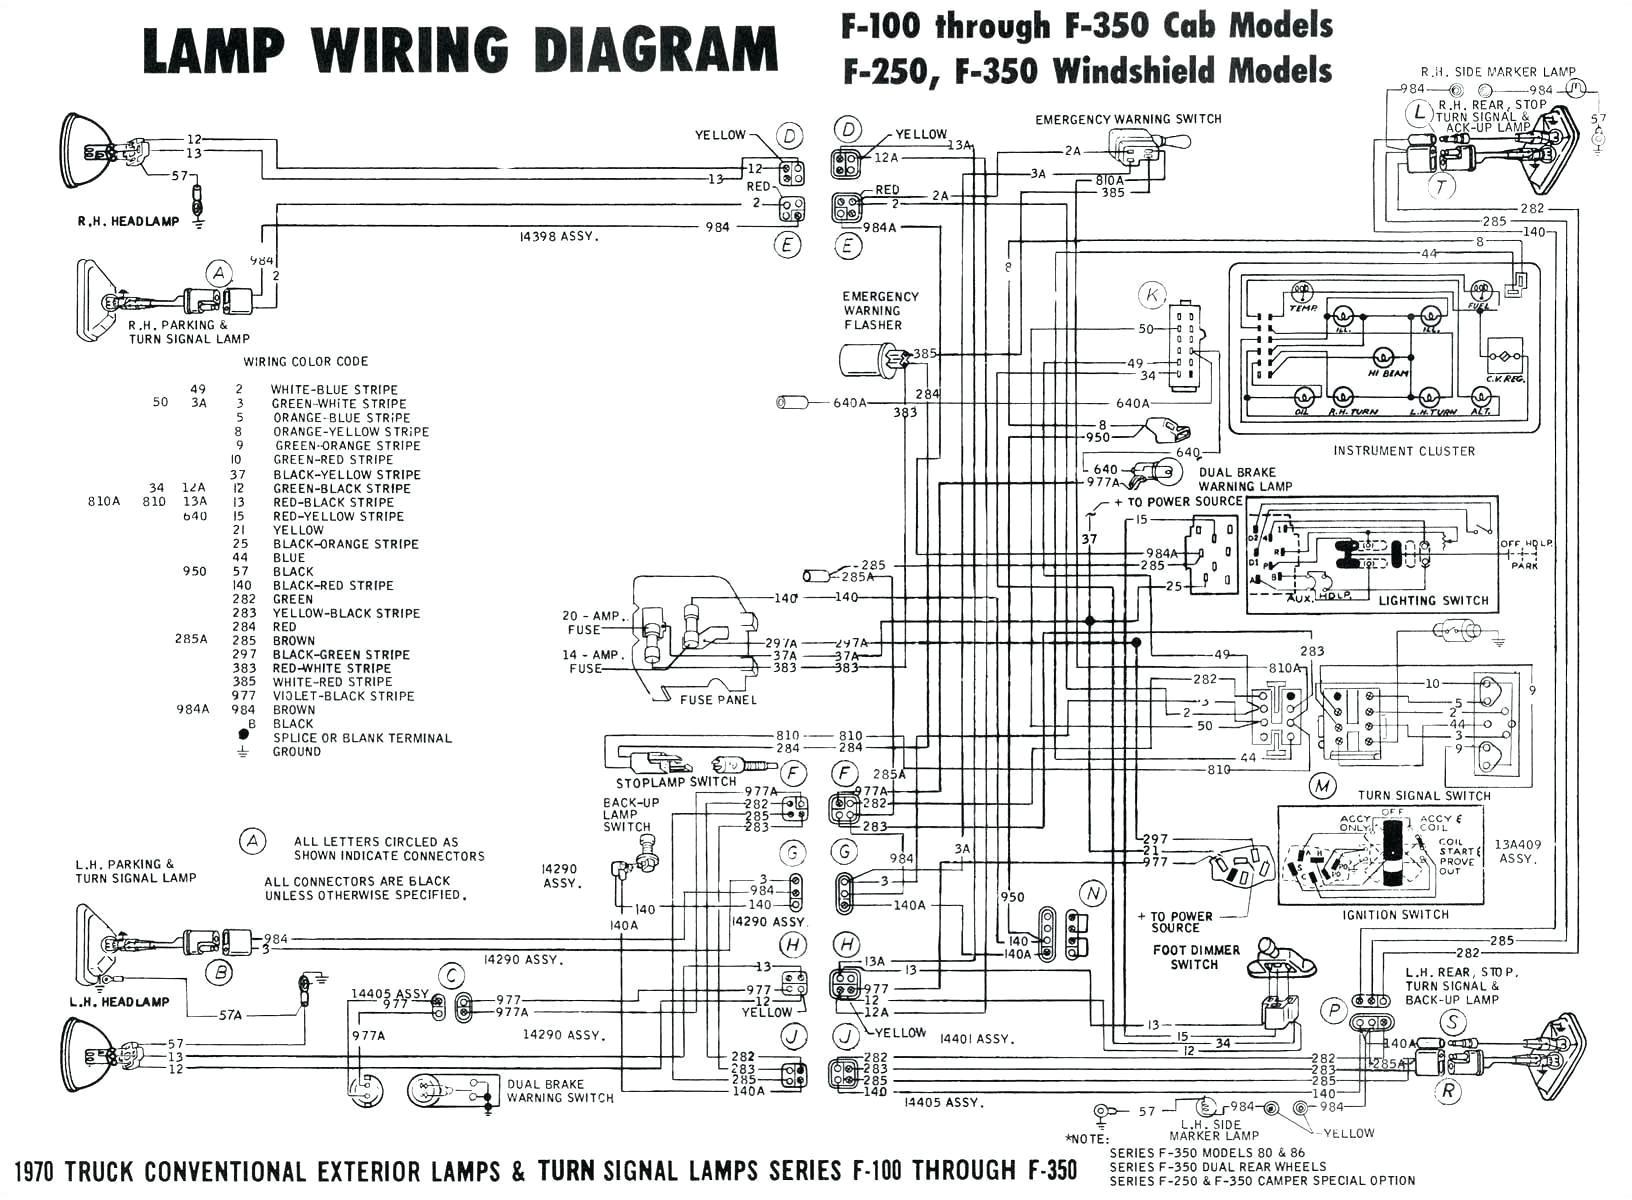 del sol engine d16z6 d16z6 wiring harness diagram is a 1993 honda type r likewise 1997 honda civic vtec engine on d16z6 engine diagram